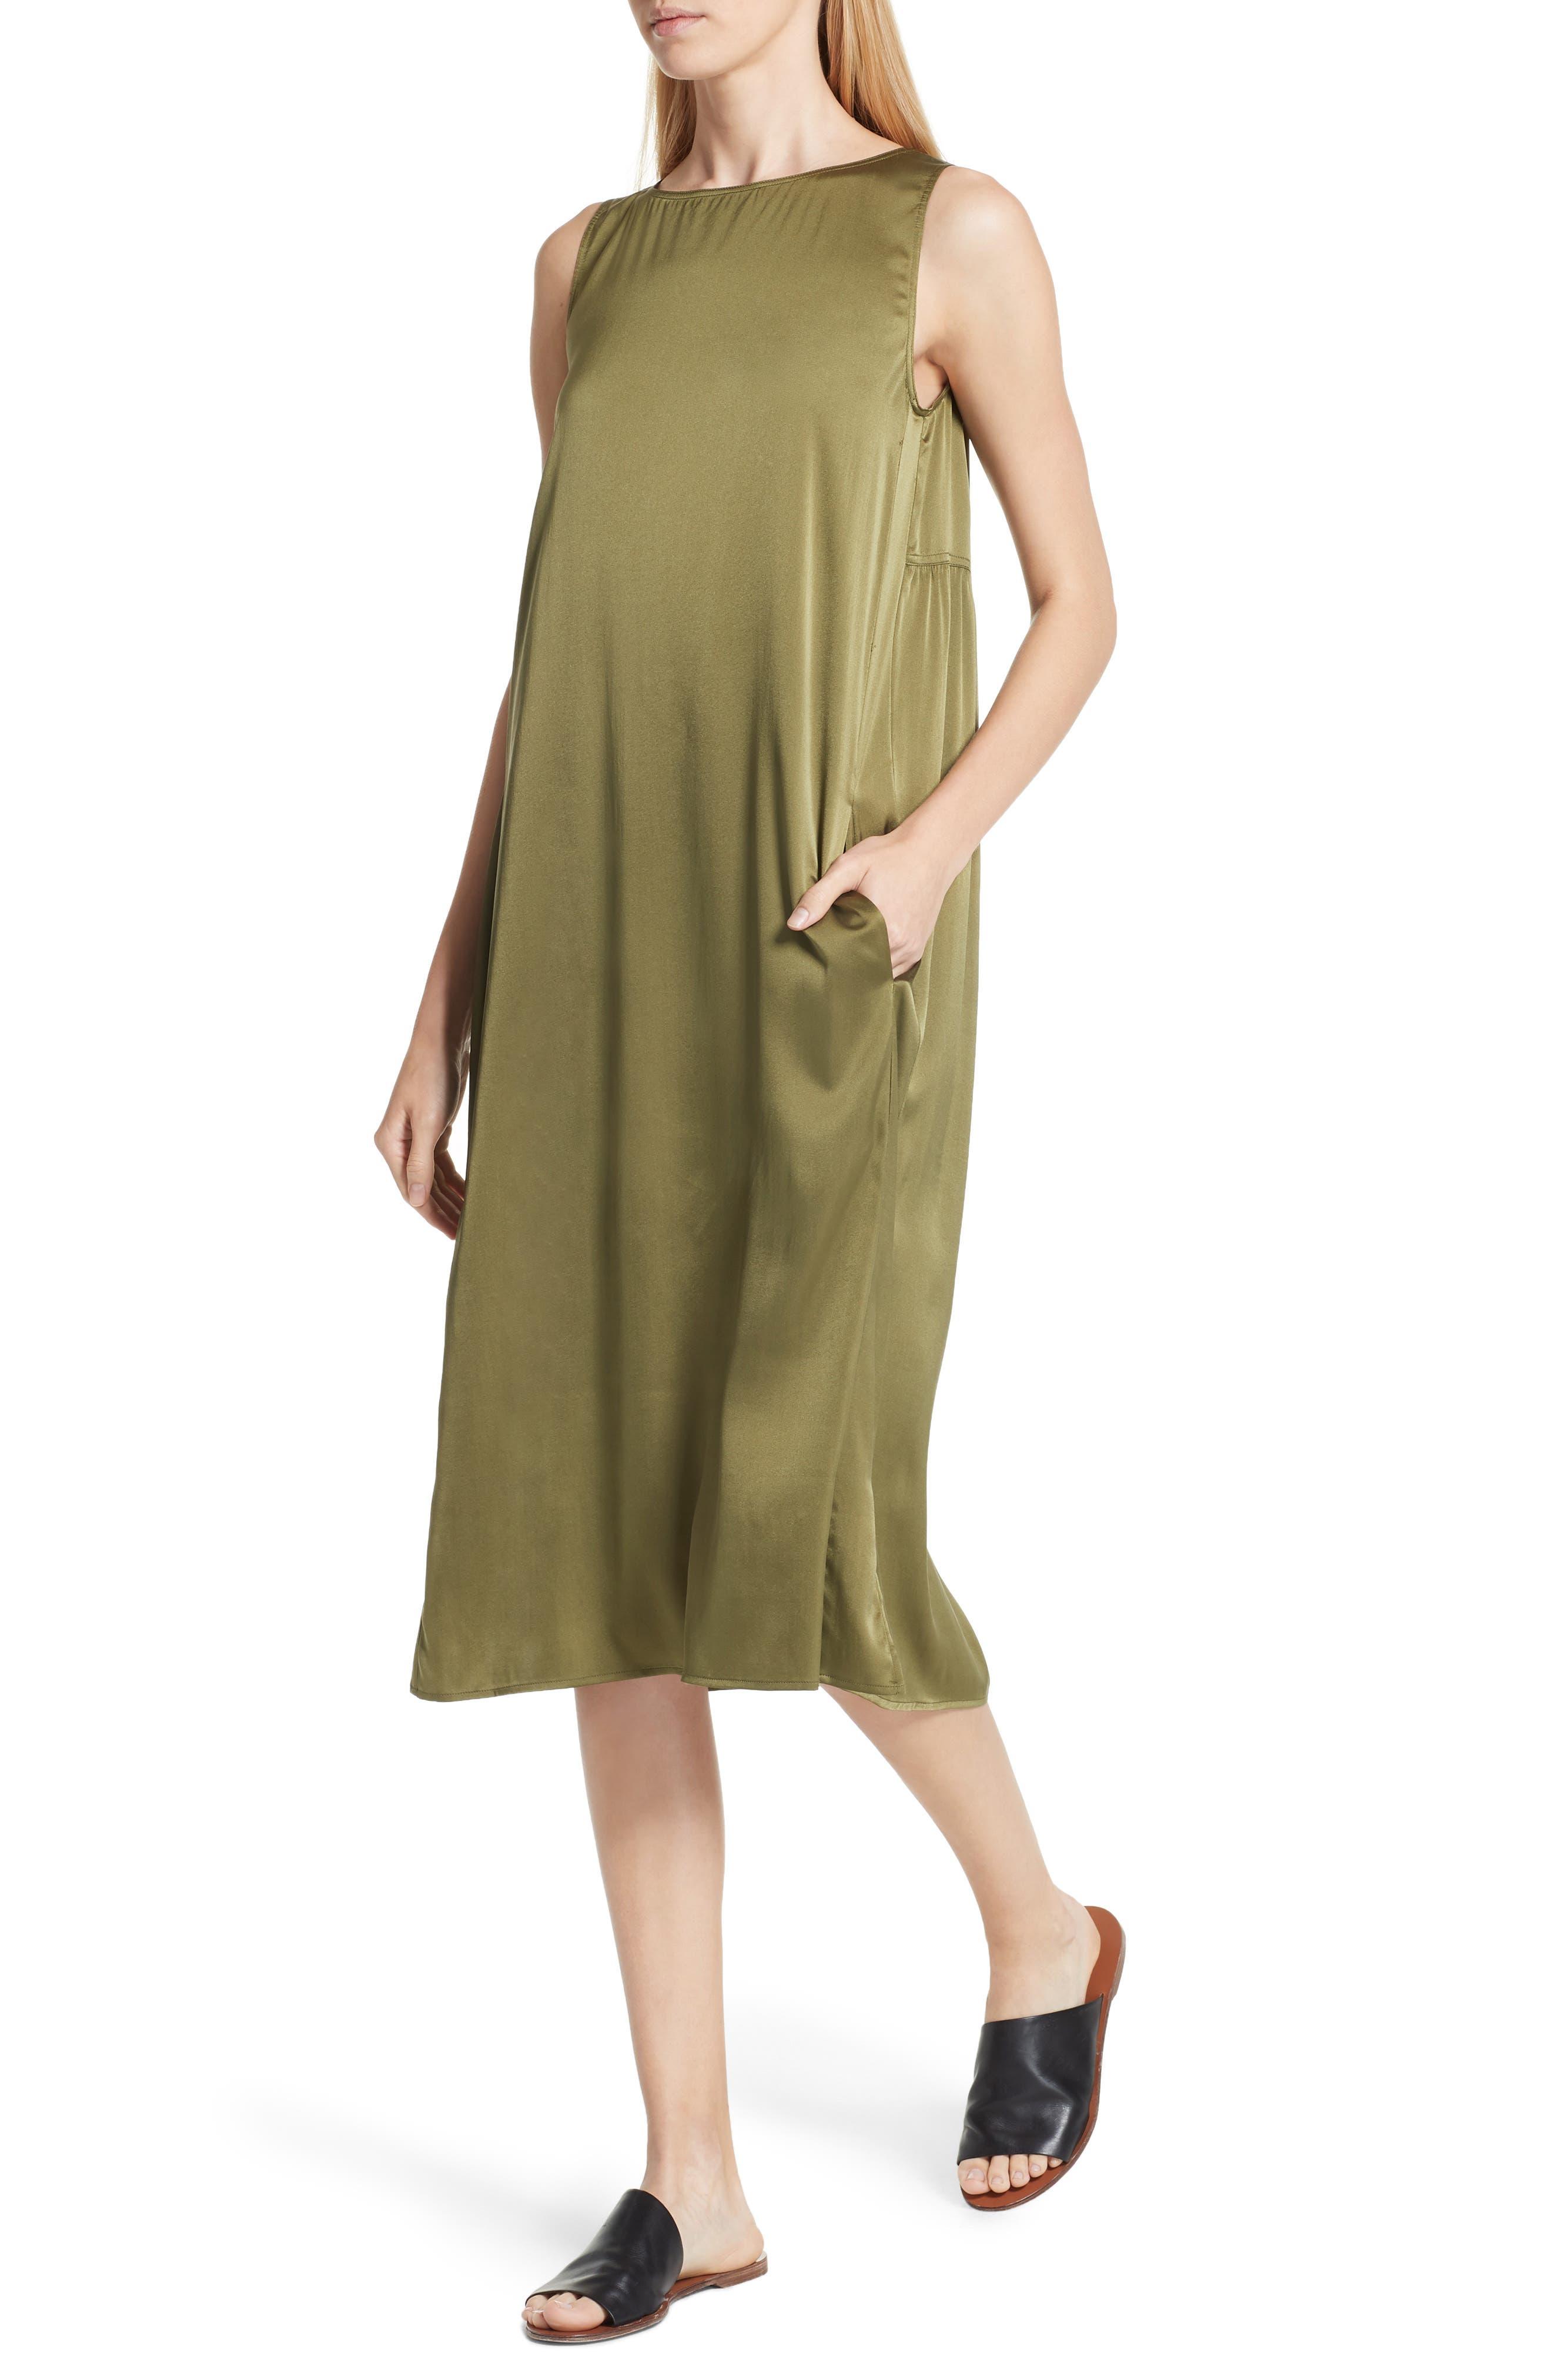 EILEEN FISHER,                             Stretch Silk Tank Dress,                             Alternate thumbnail 4, color,                             301